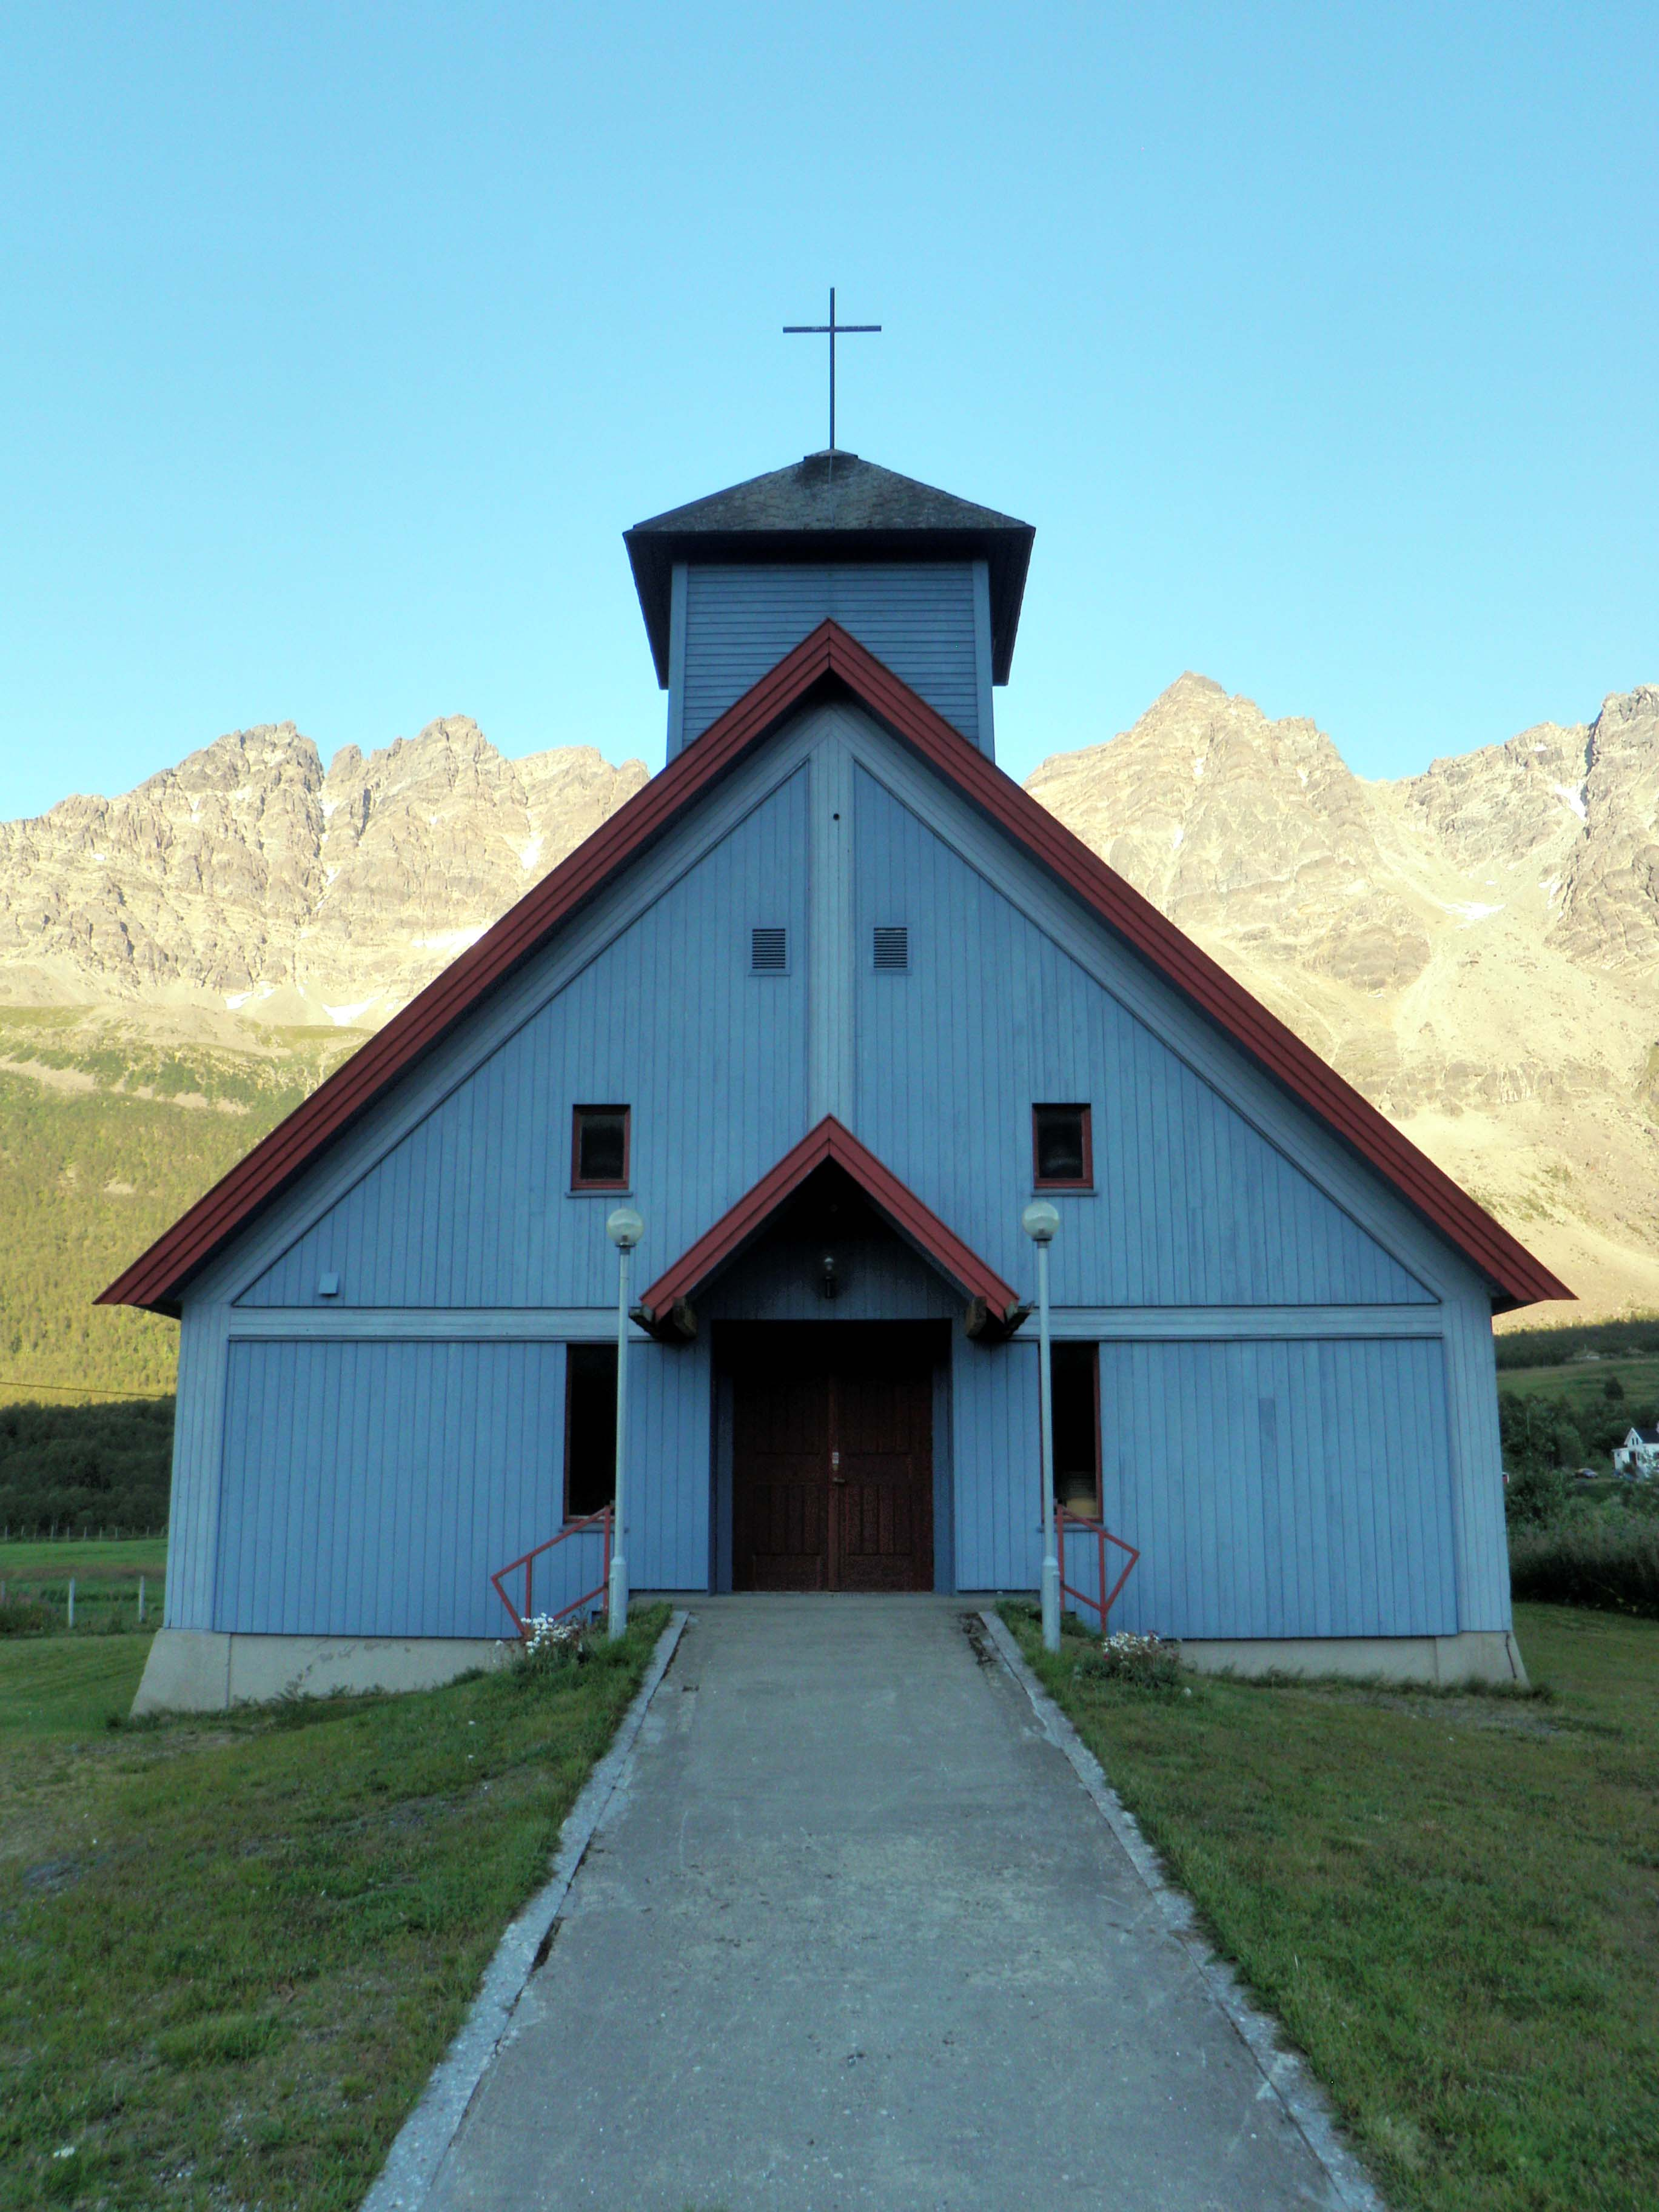 Lakselvbukt kirke